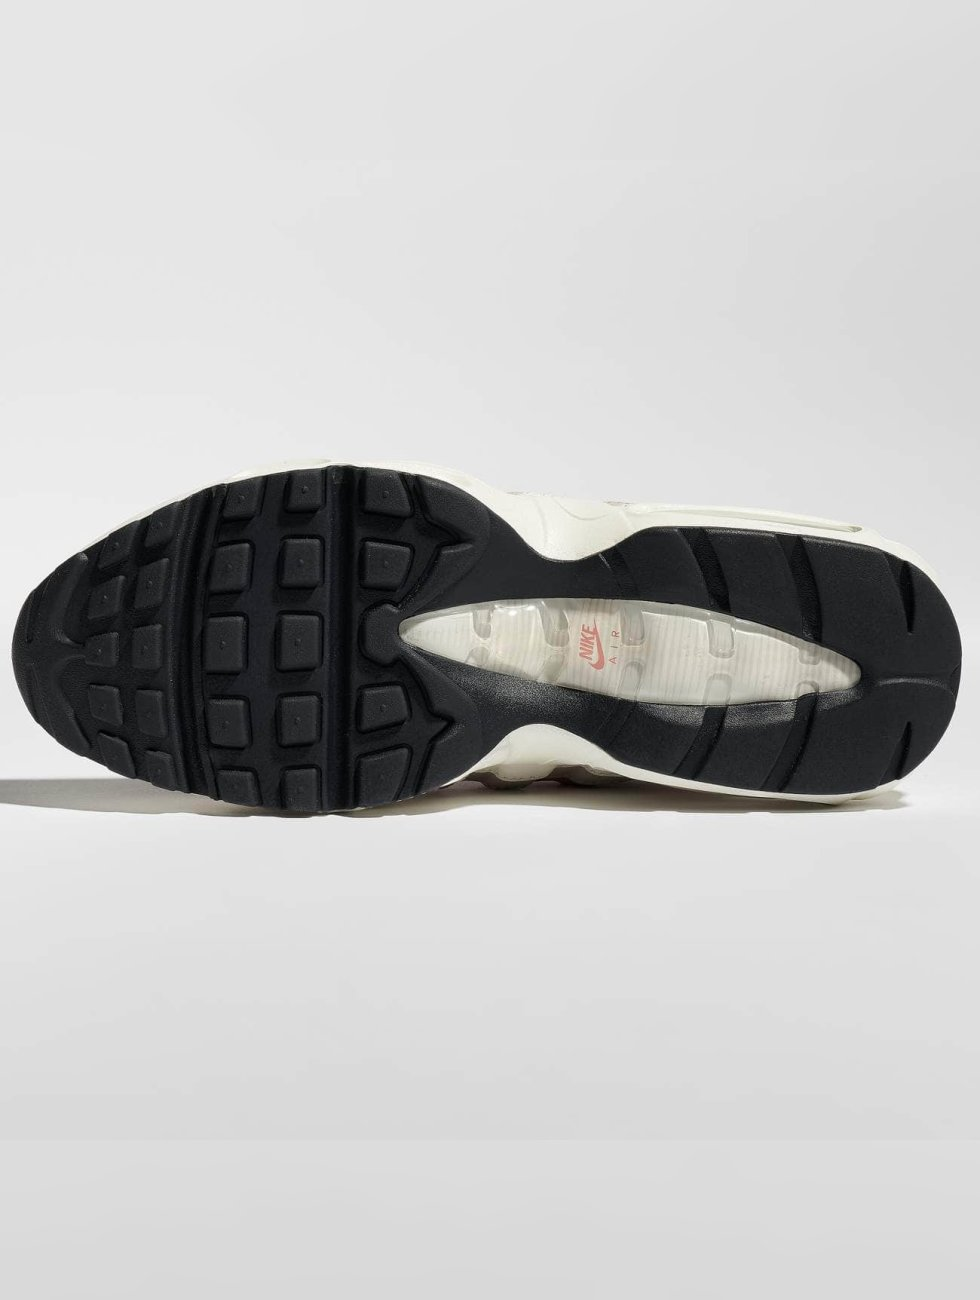 Nike Schoen / Sneaker Air Max 95 Essenziale Ingegno 442.635 SH0PxtM2gm